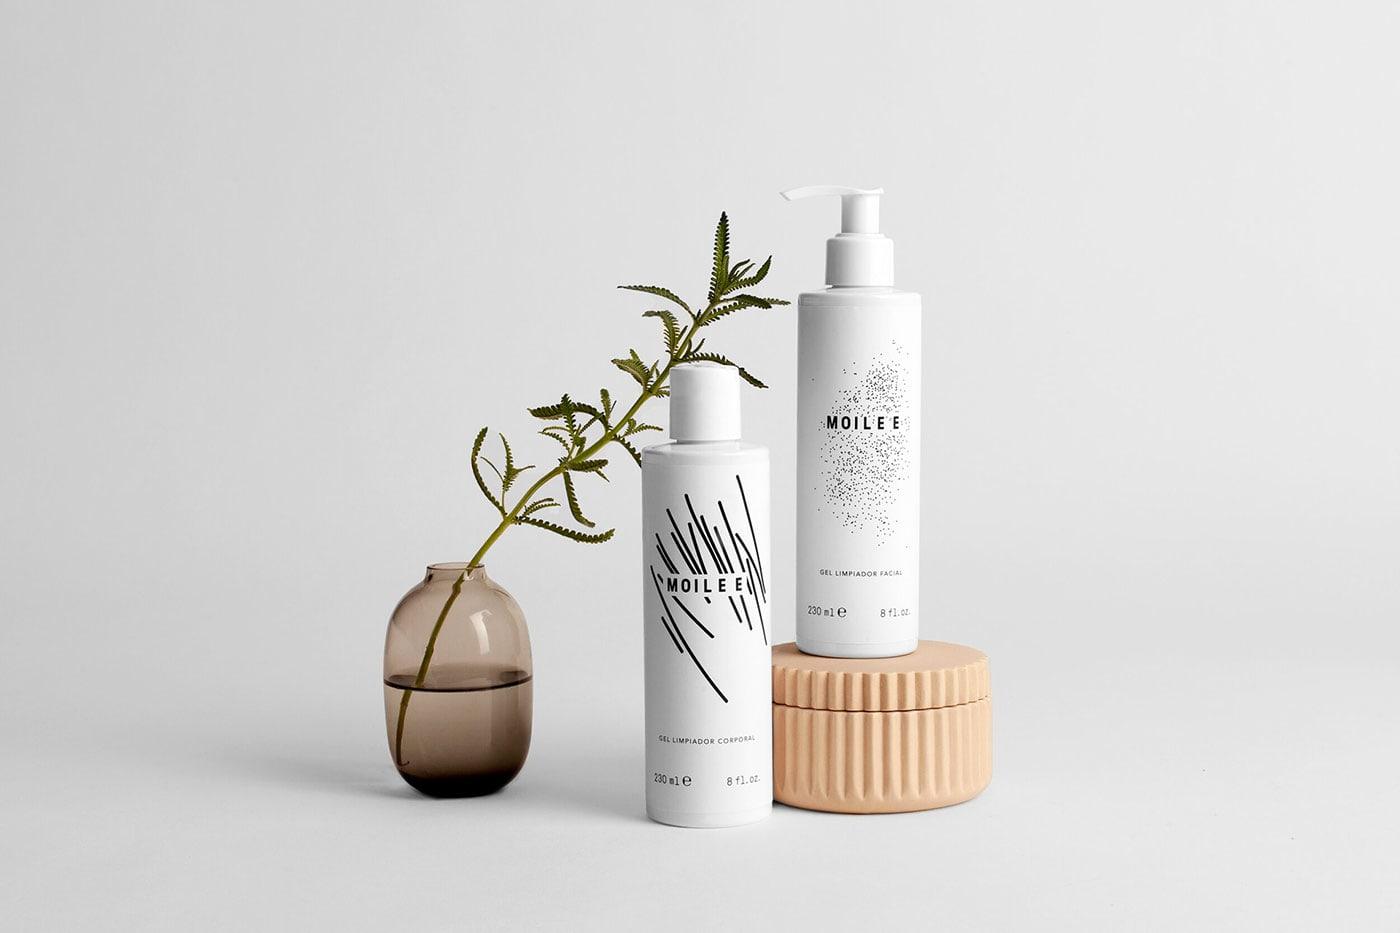 护肤品牌Moilee包装设计